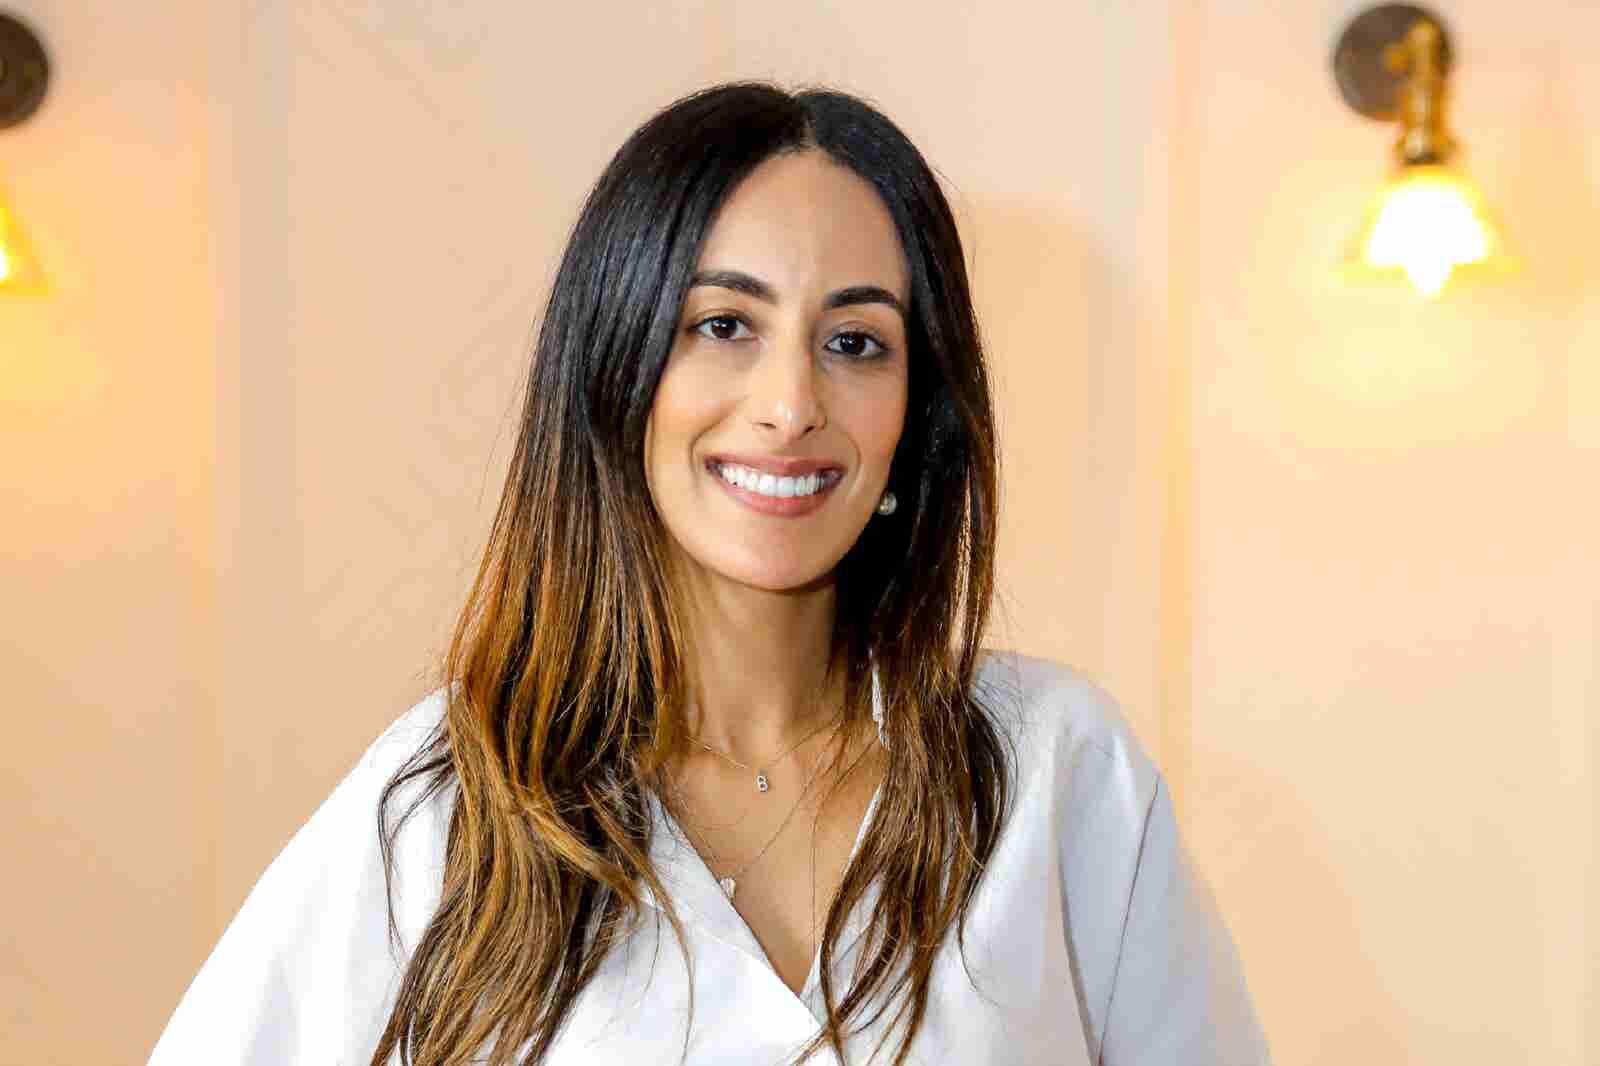 Profits With Purpose: AUrate Co-Founder Bouchra Ezzahraoui